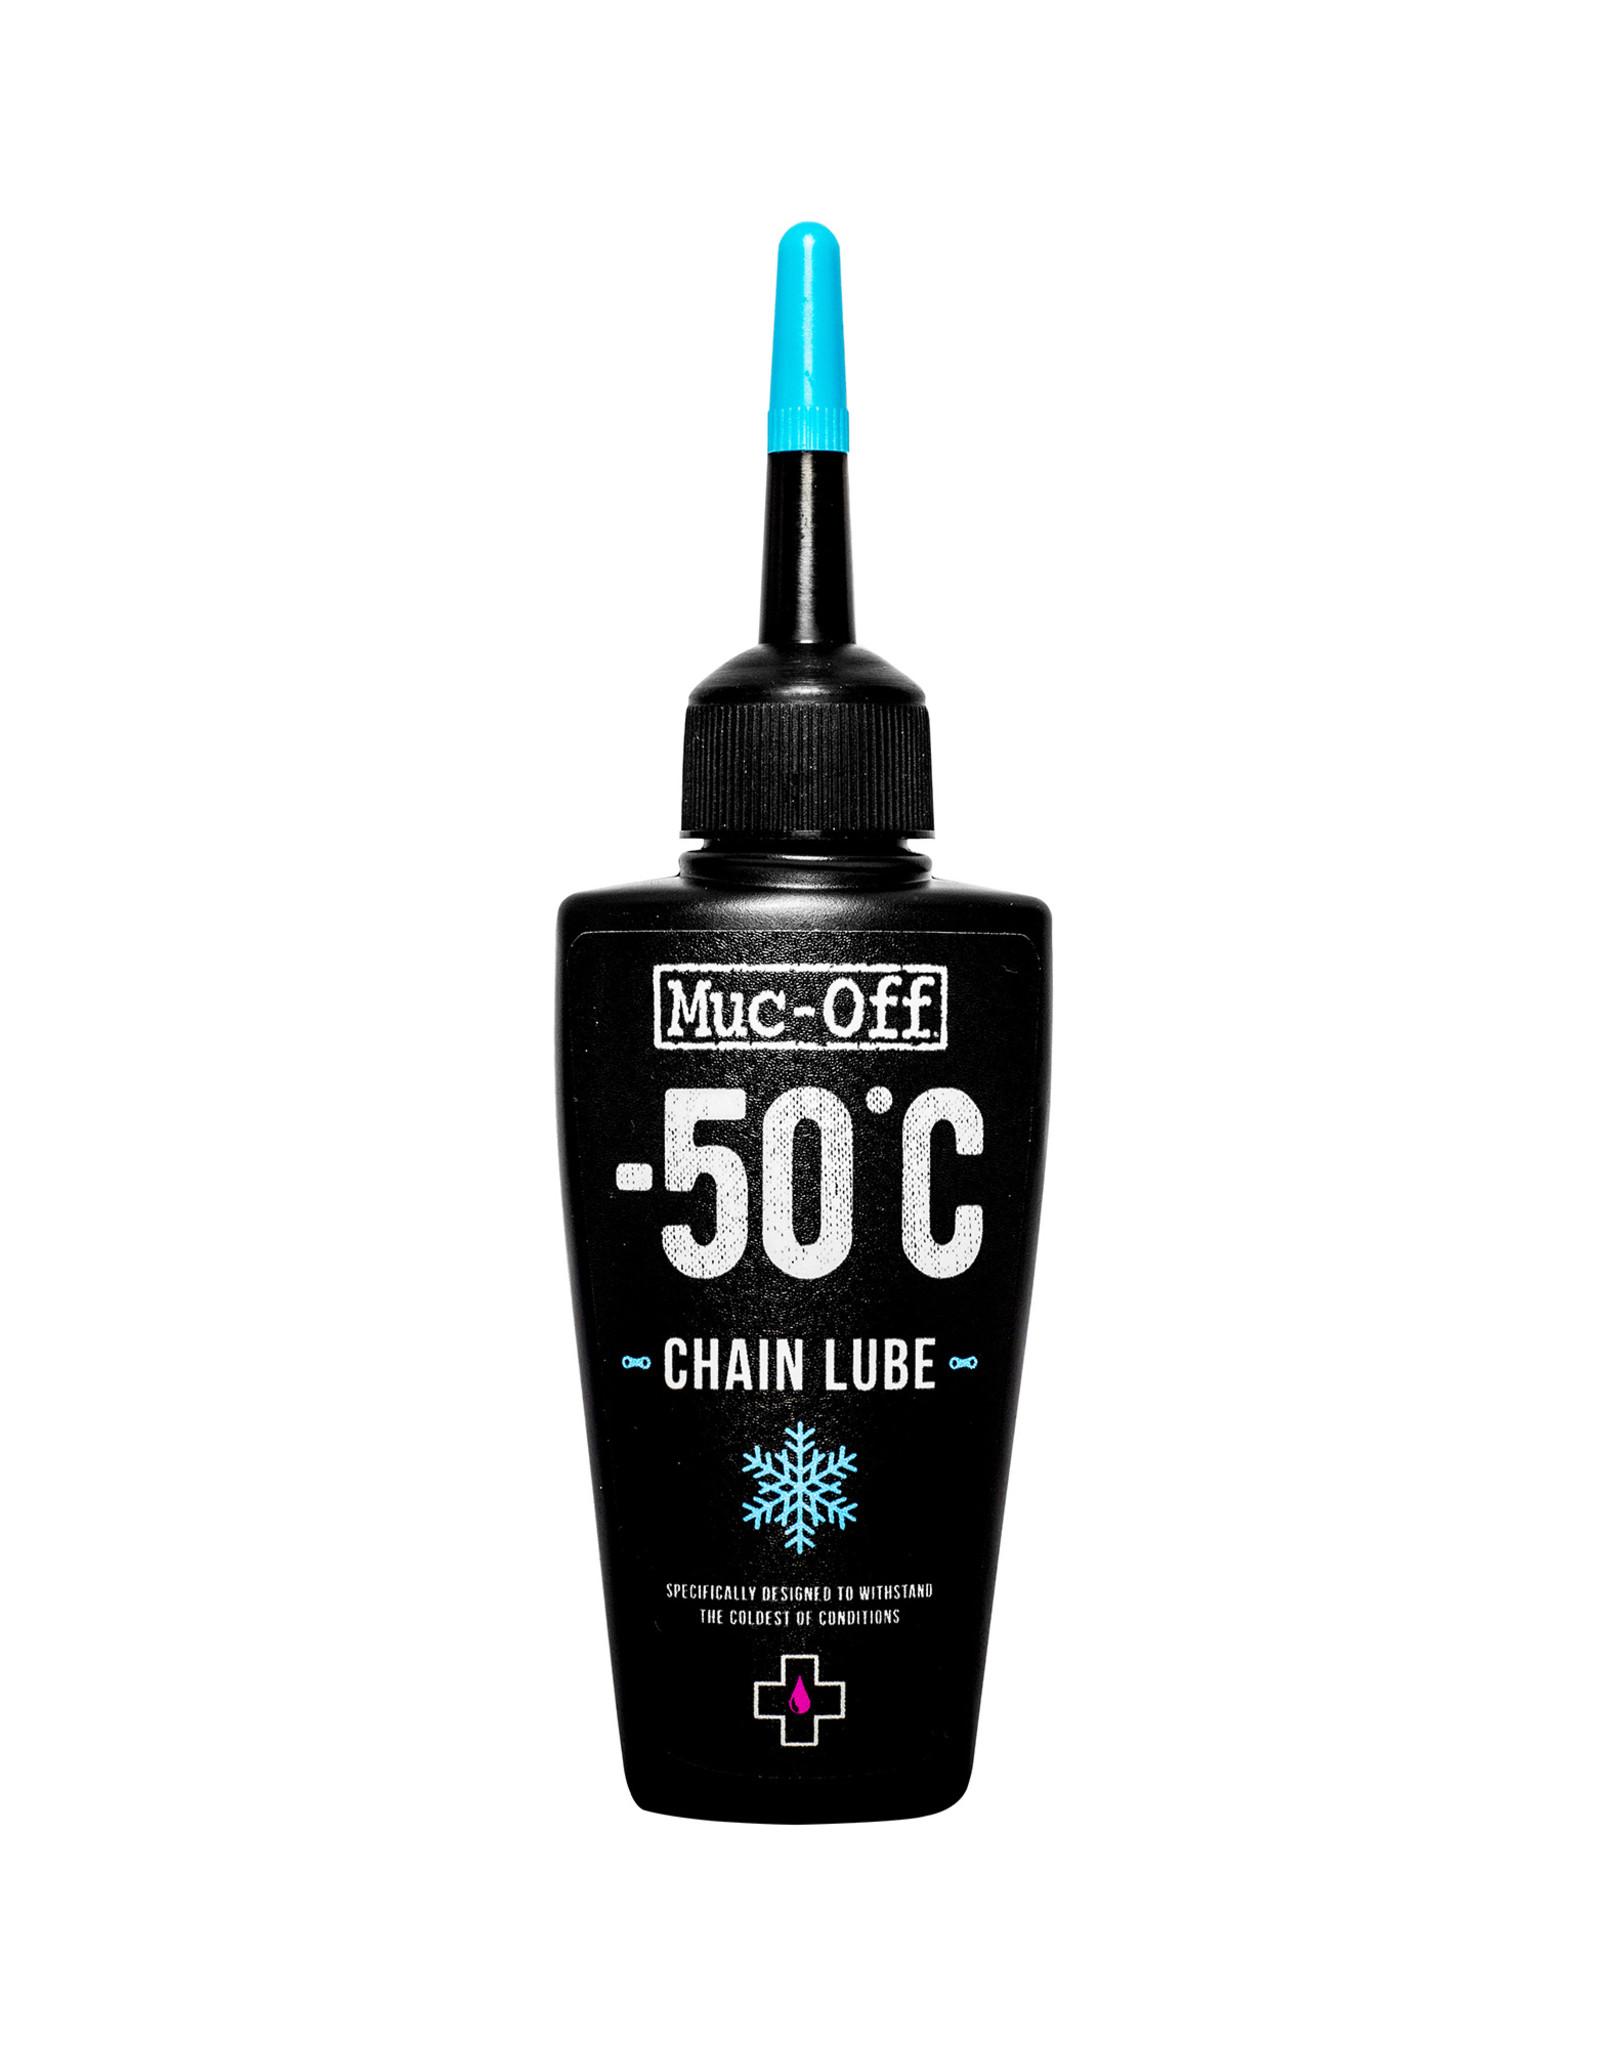 Muc-Off Muc-Off, -50C, Lubrifiant, 50ml